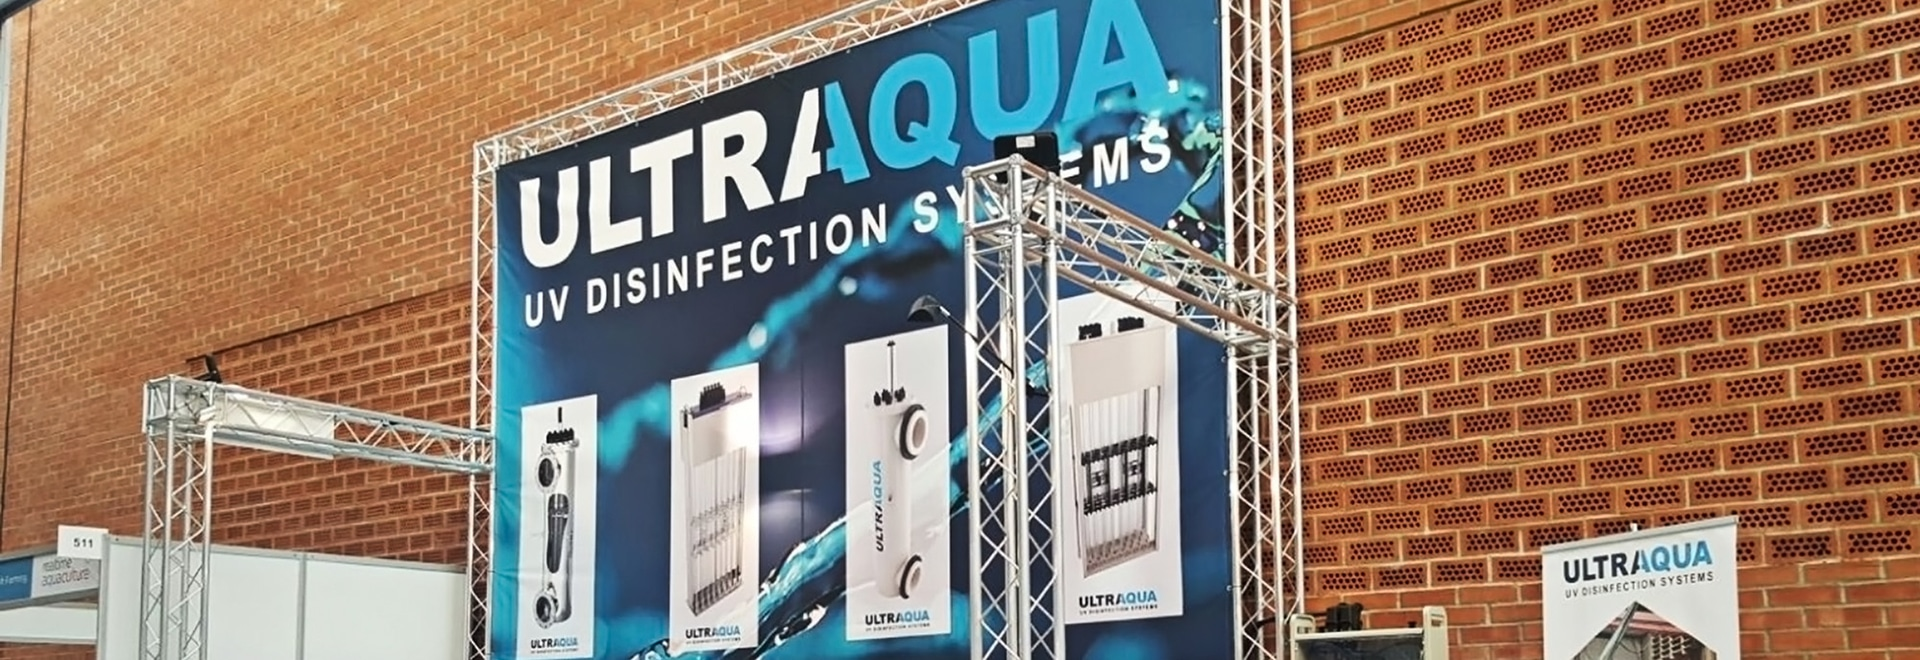 ULTRAAQUA's exhibition booth